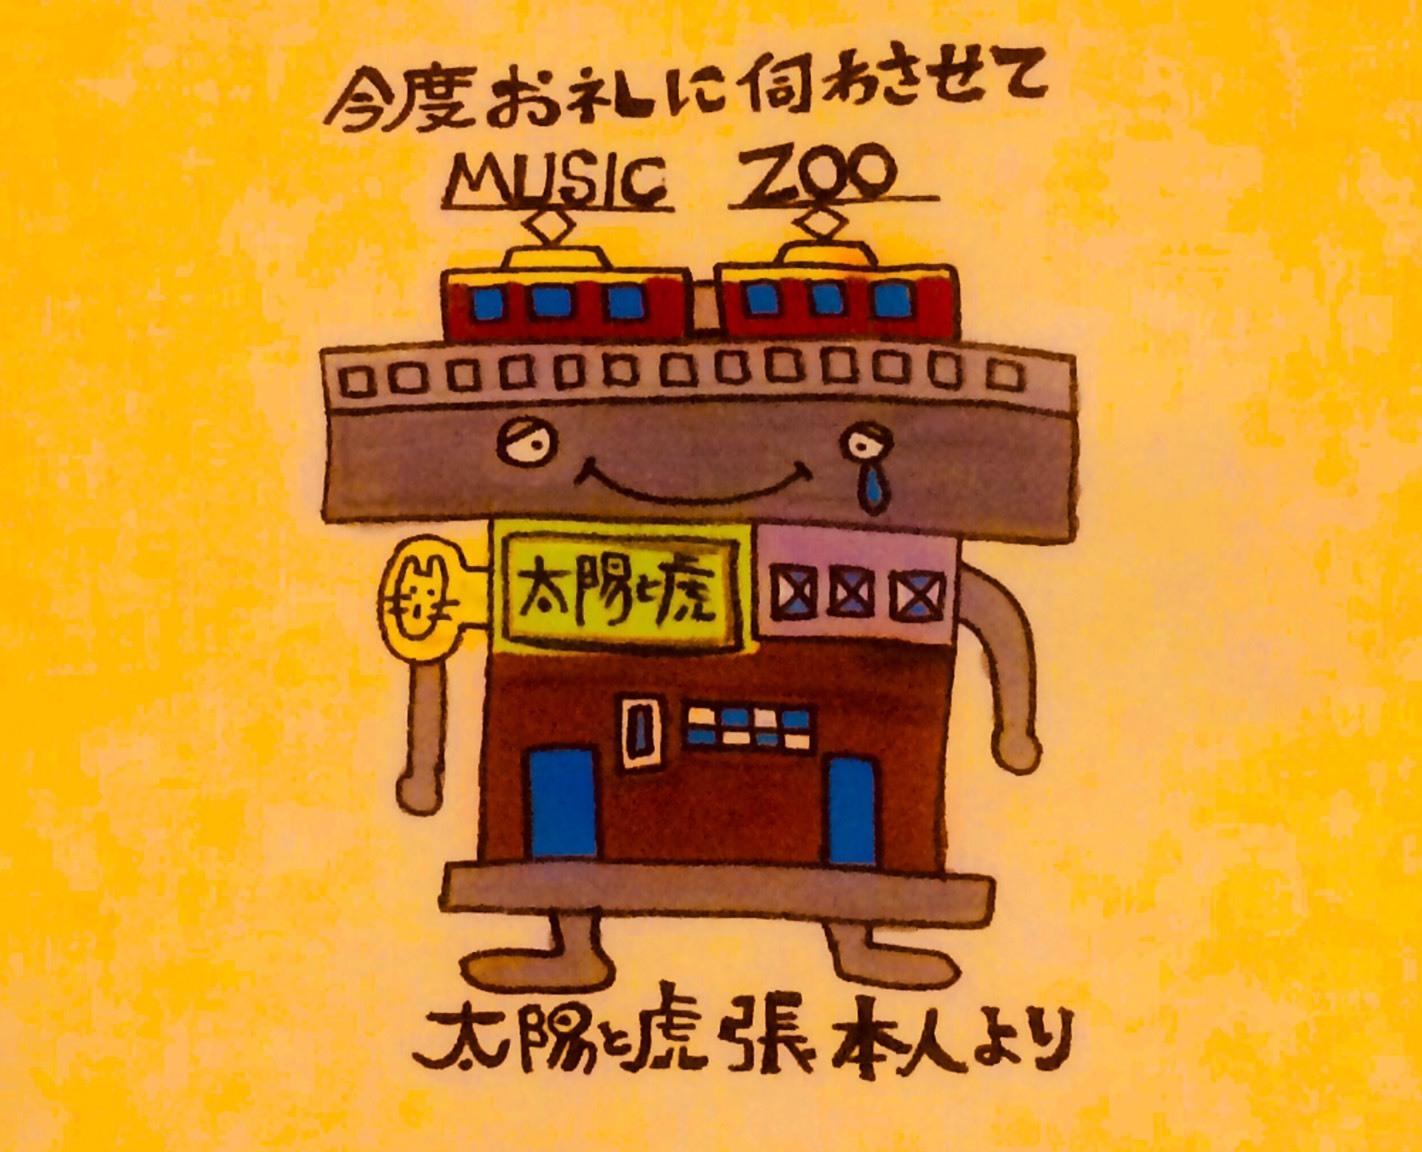 S__7774211.jpg